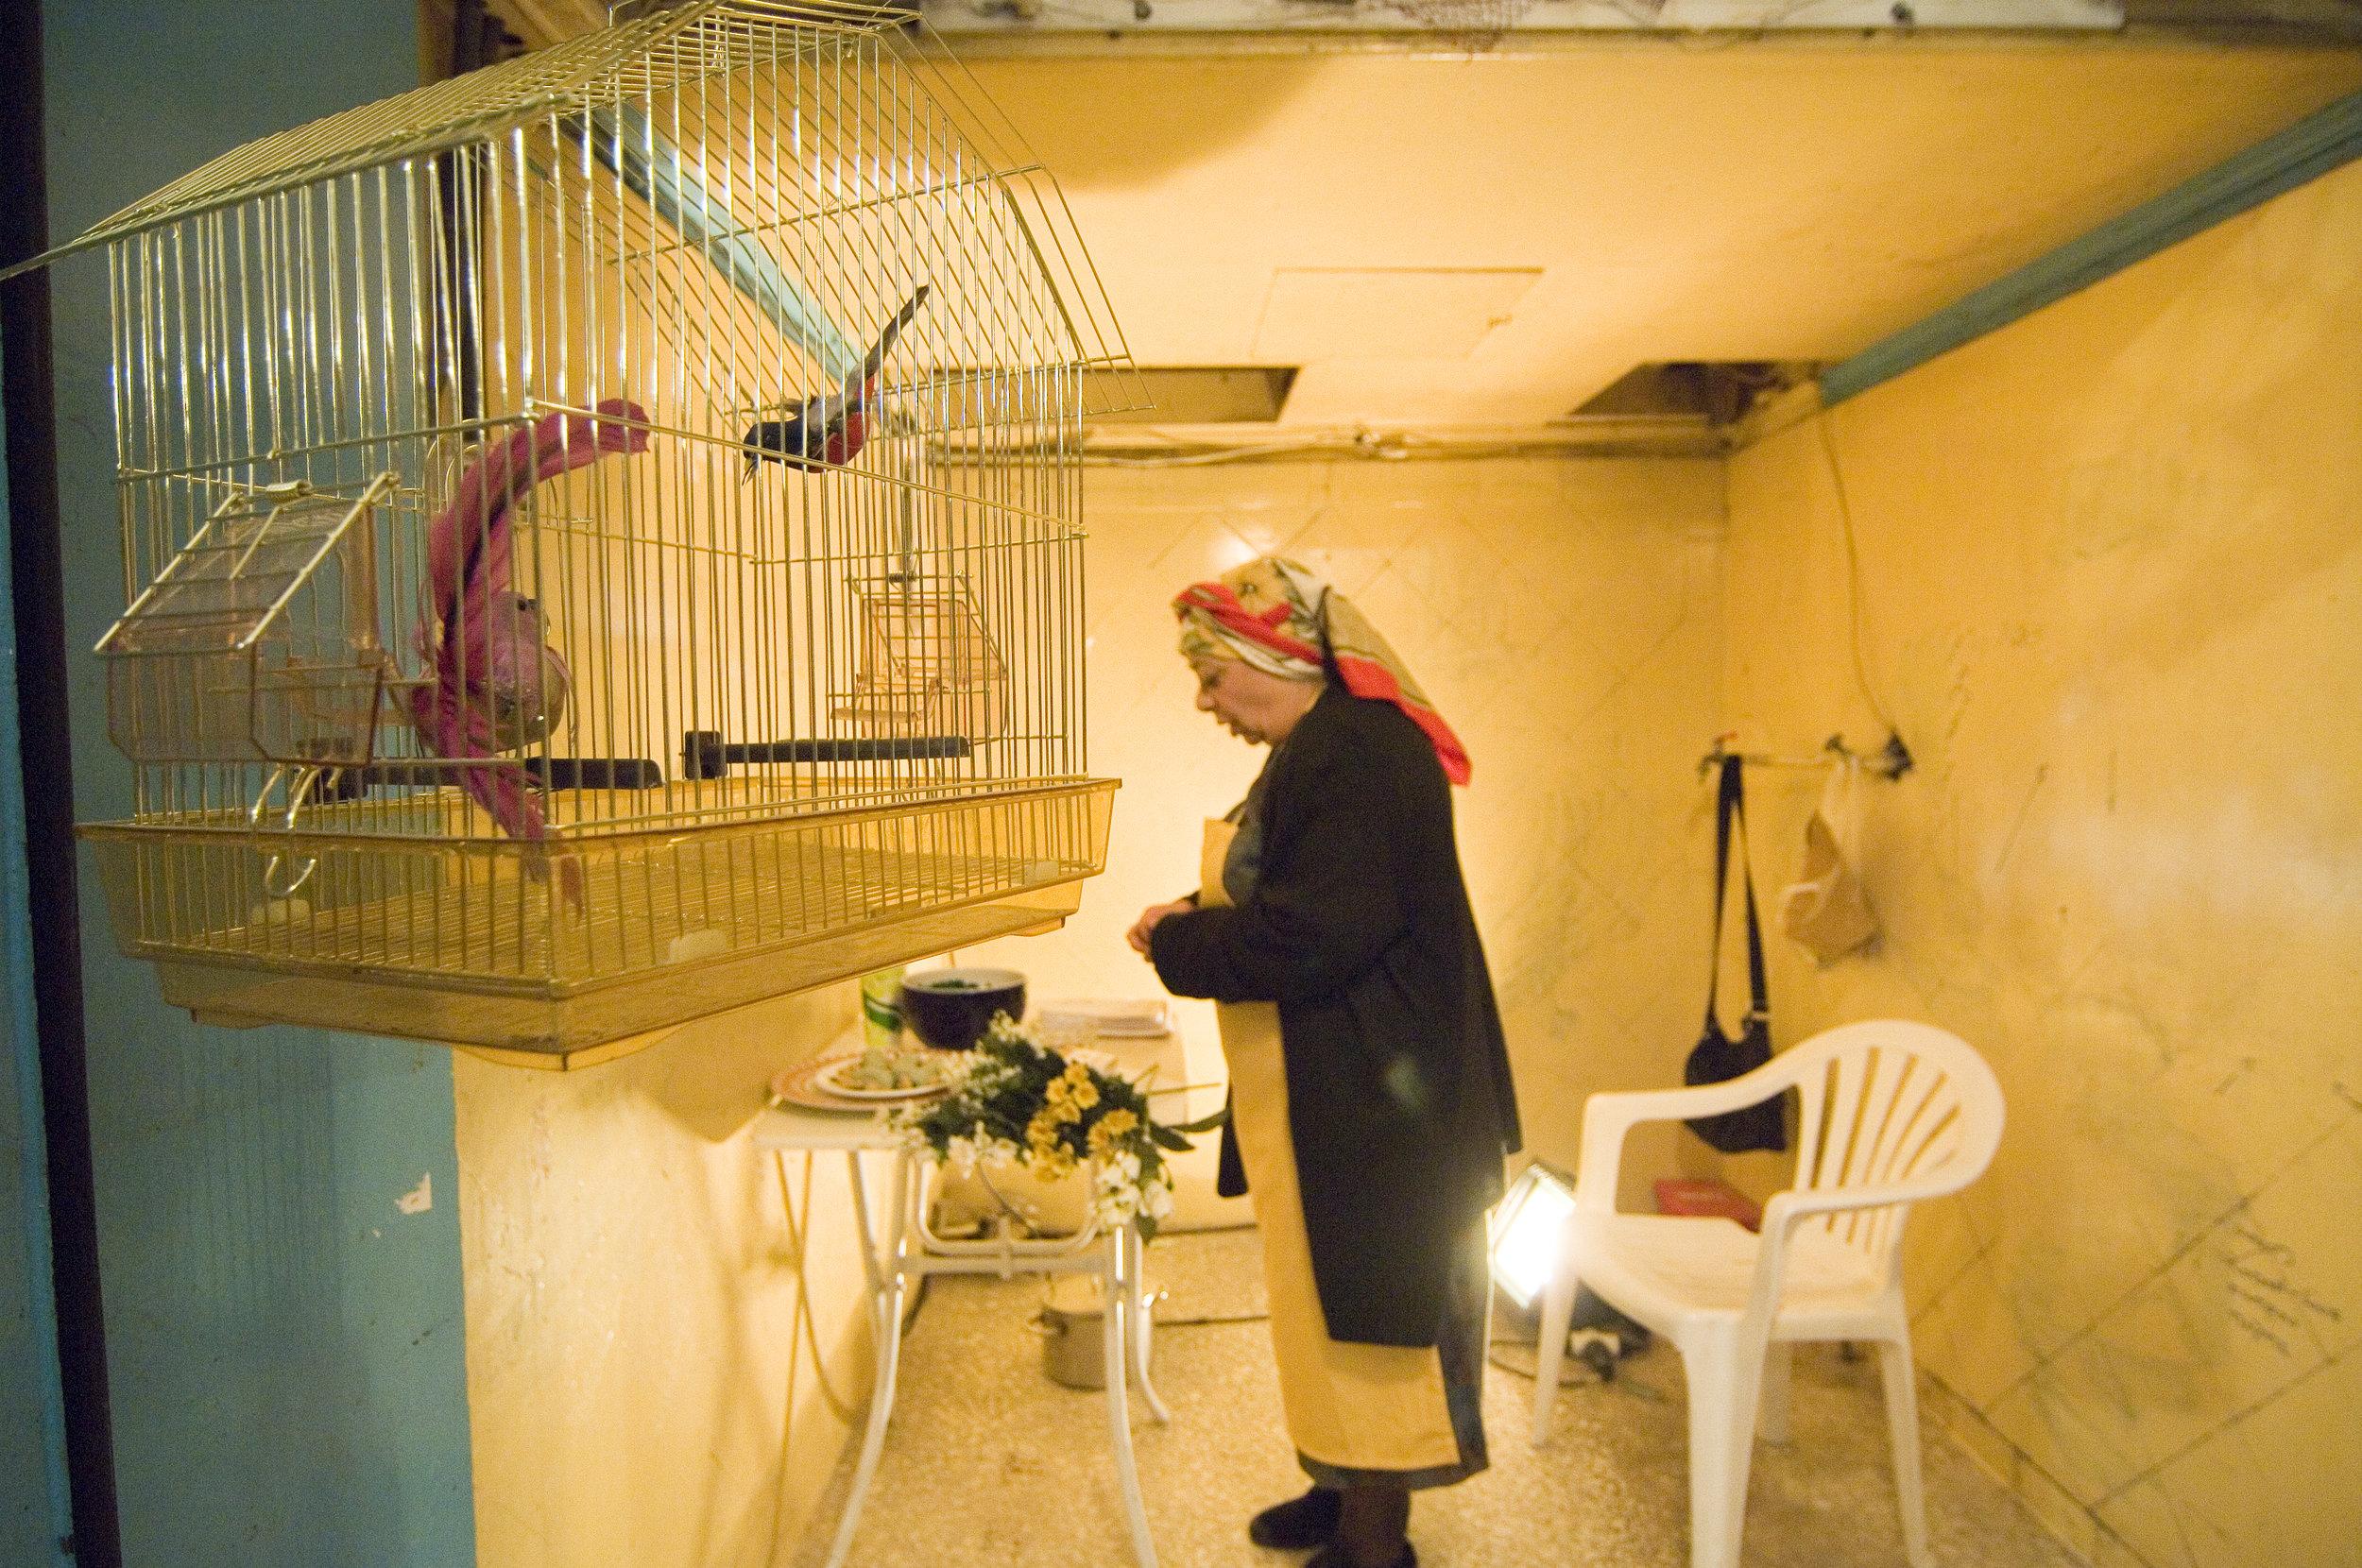 """Talking to Terrorists"" / Municipal market of Kypseli, 2008 / by Robin Soans / directed by Kyriaki Spanou"